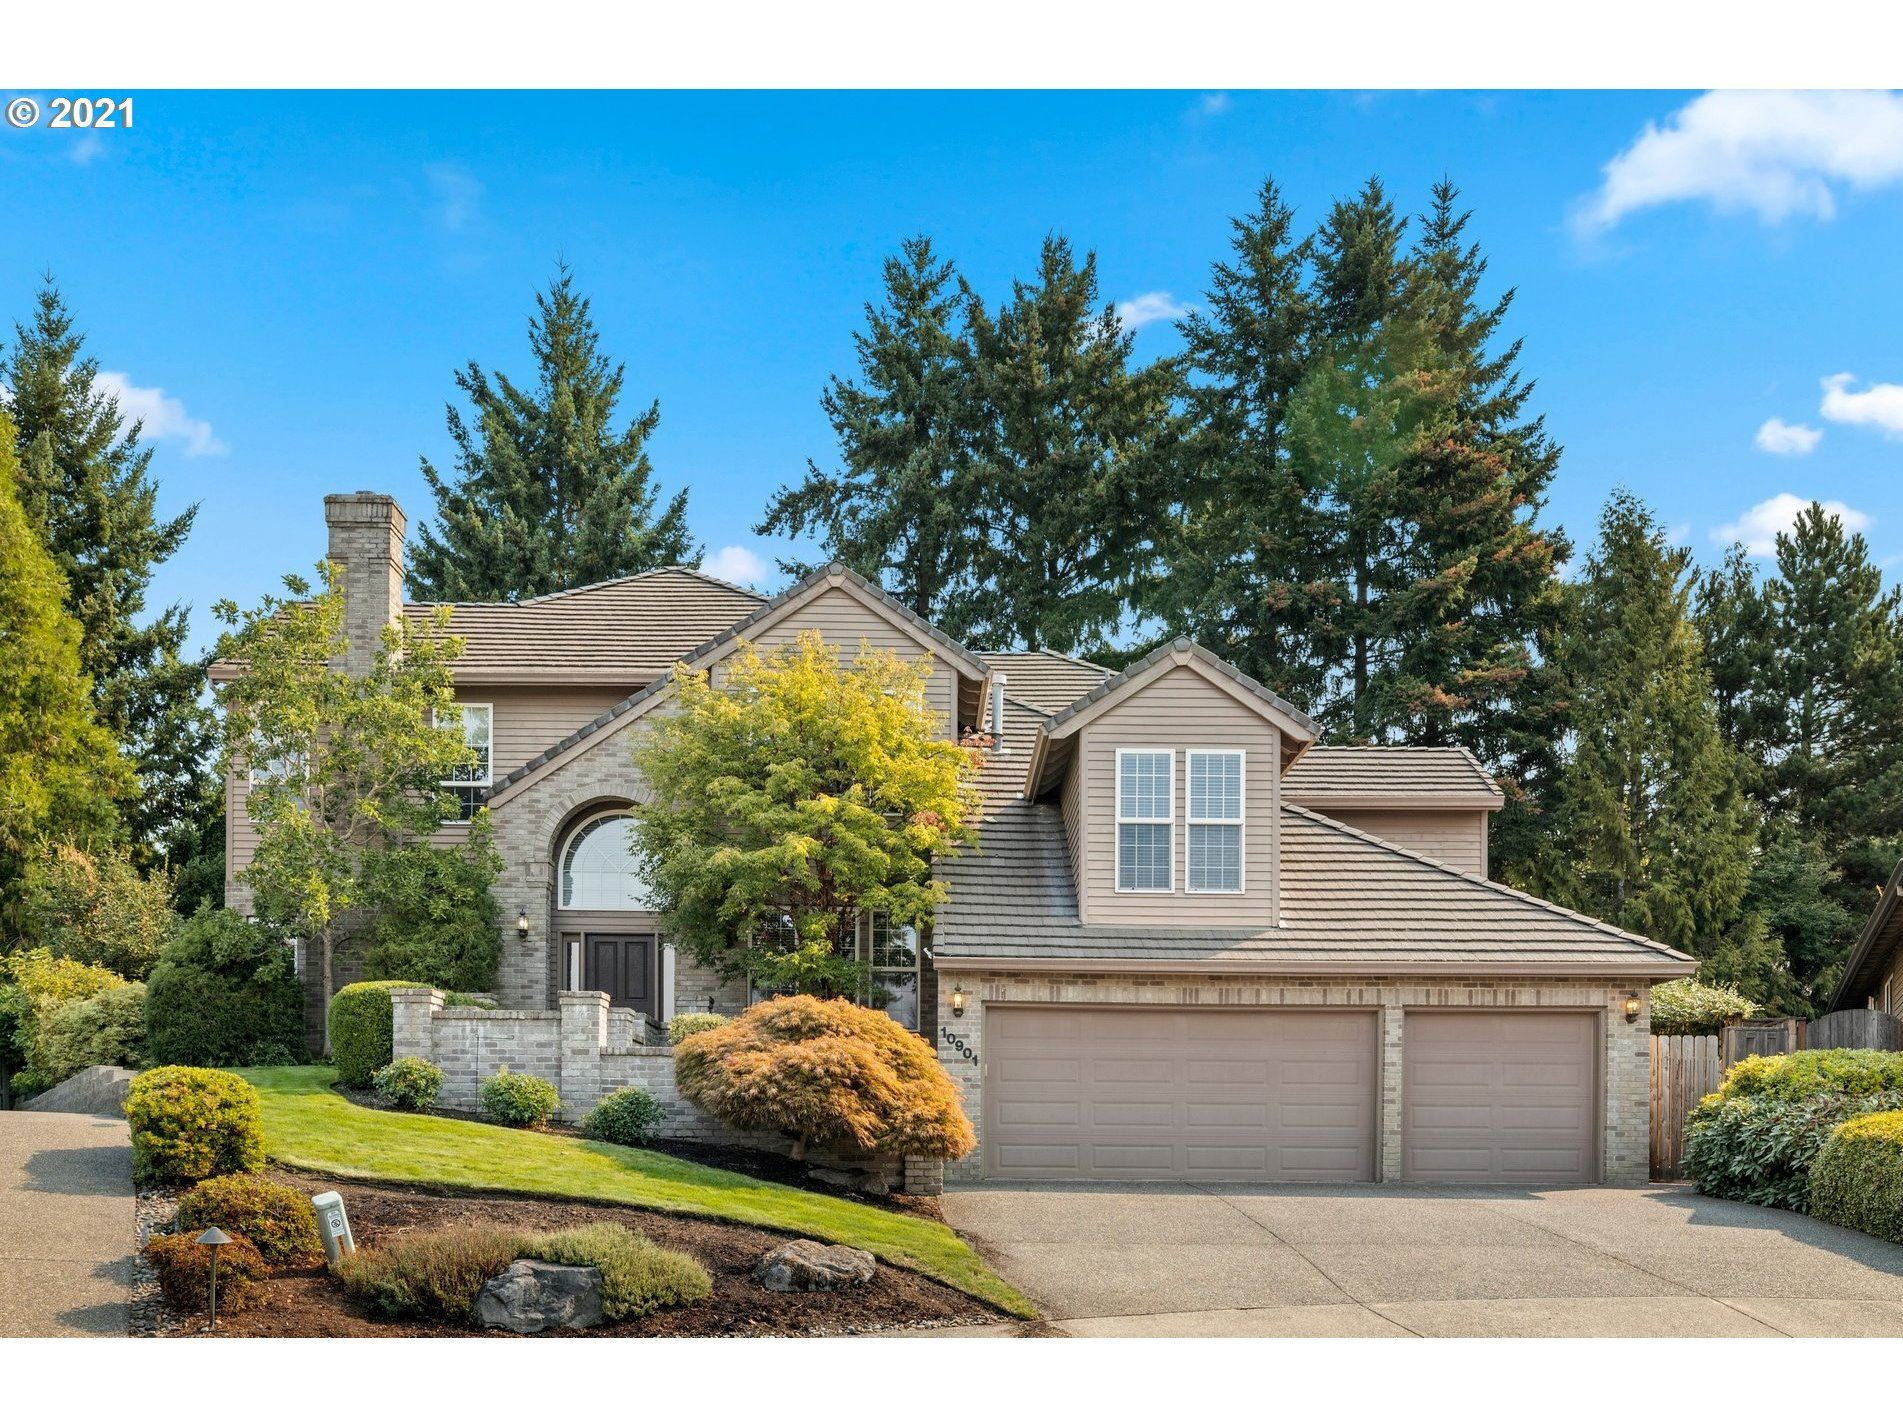 10901 NW LUCERNE CT, Portland, OR 97229 - MLS#: 21037485